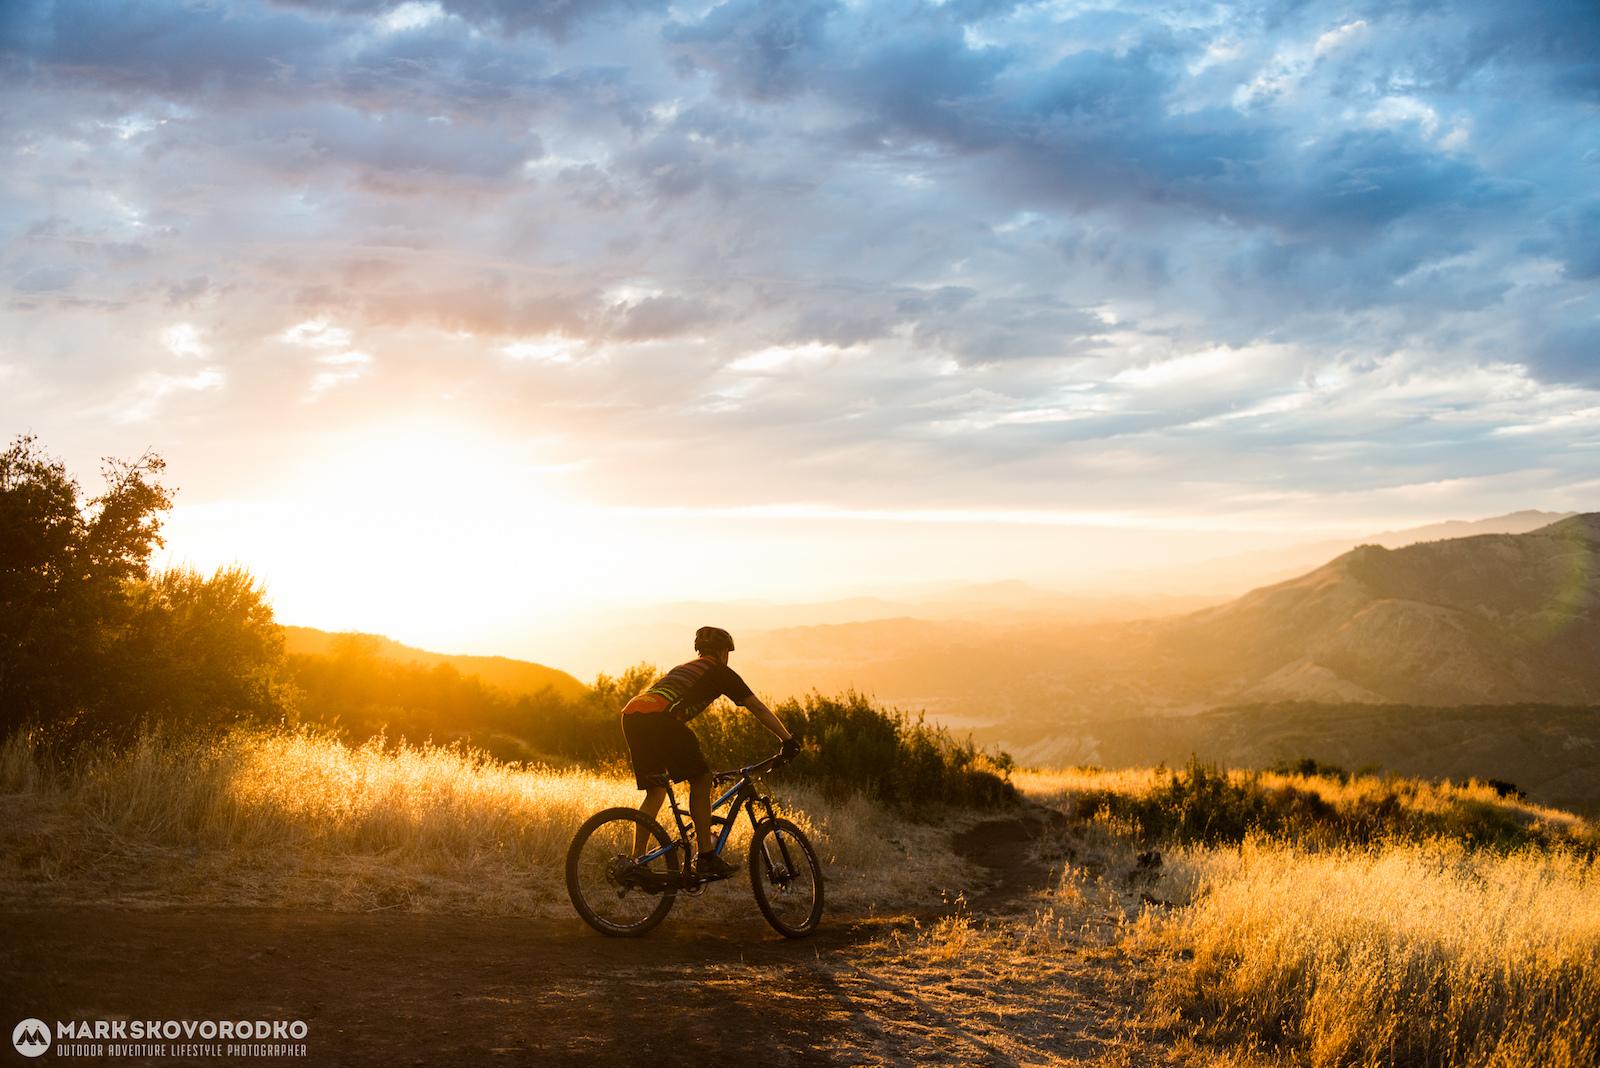 Filipp Kozachuk descends Snyder Trail a.k.a. Knapp s in the backcountry of Santa Barbara California as the sun sets over the Santa Ynez Valley.